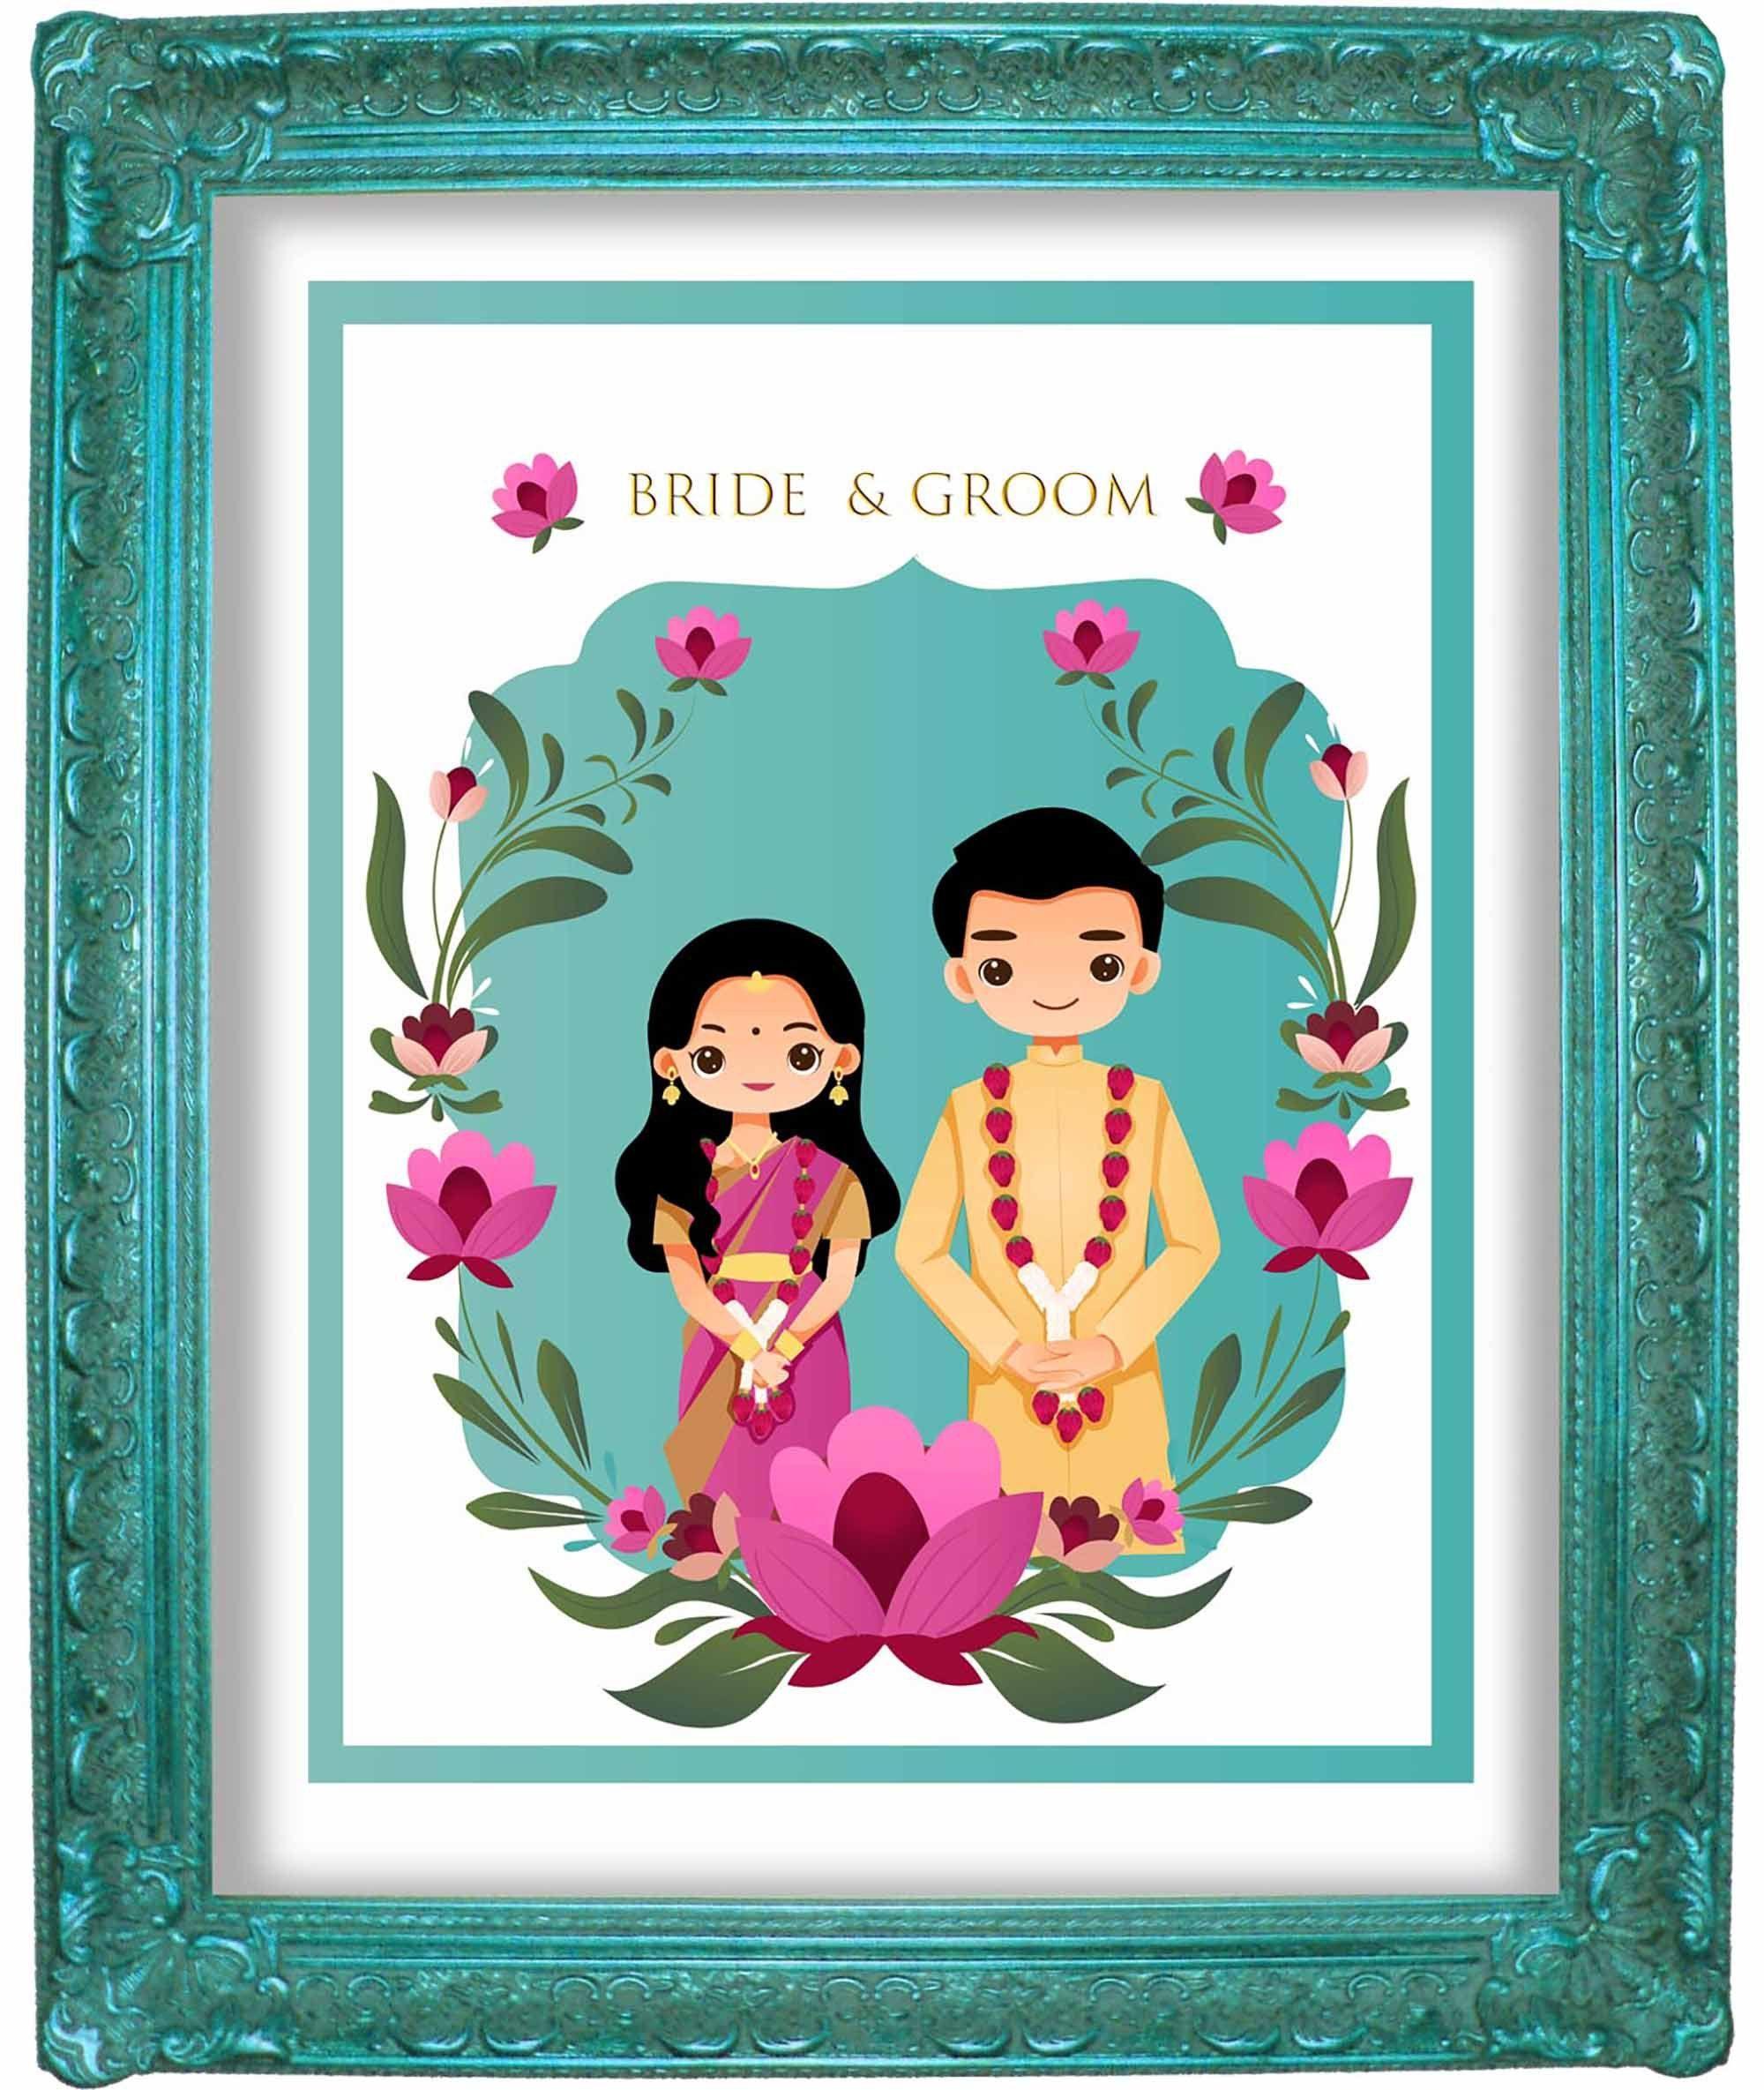 Diy Printable Editable Indian Wedding Invitation Card Template Instant Download Diy Editable Template In 2020 Indian Wedding Invitation Cards Wedding Invitation Card Template Indian Wedding Invitations